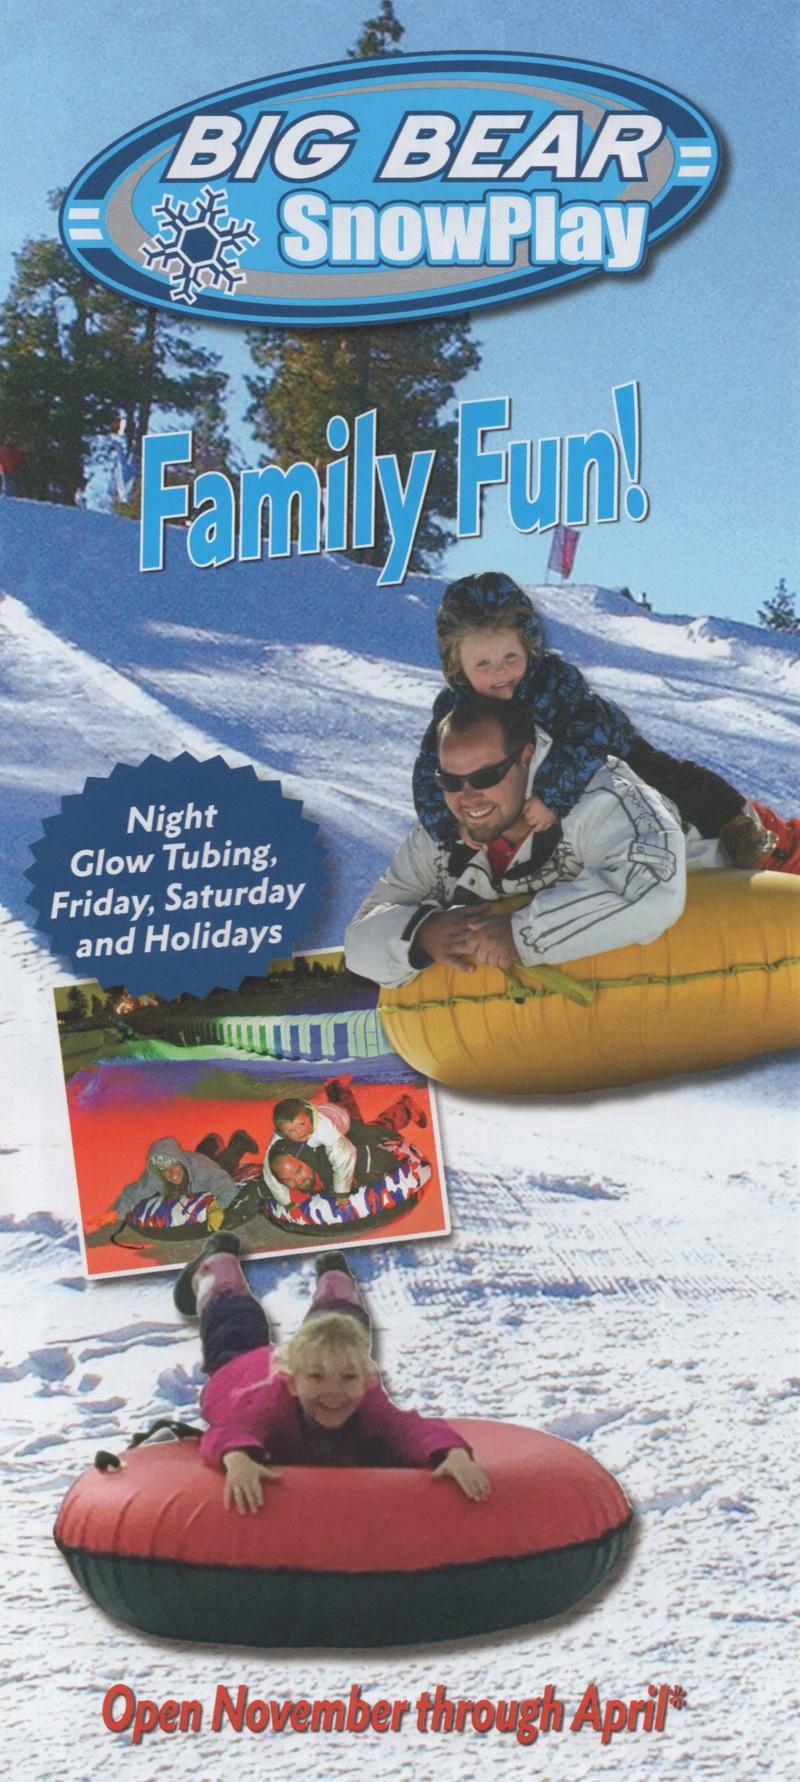 Big Bear Snowplay/Speedway